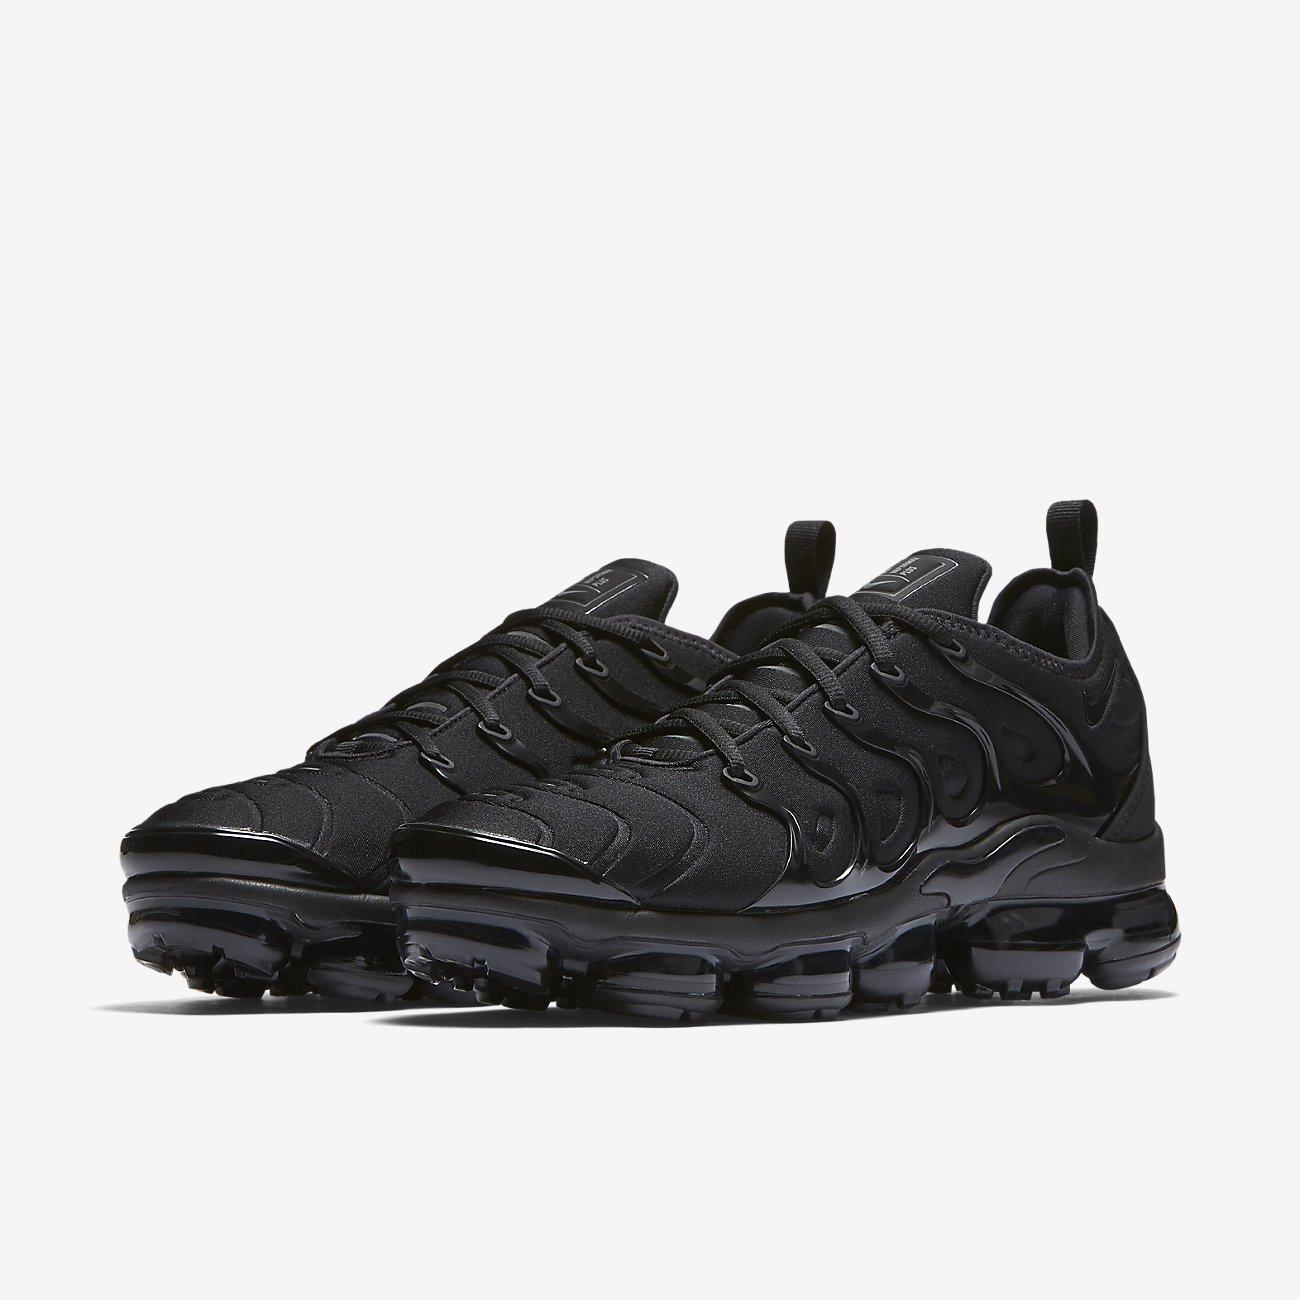 buy popular 9183a bb2e1 Nike Air VaporMax Plus - Sneakers.fr